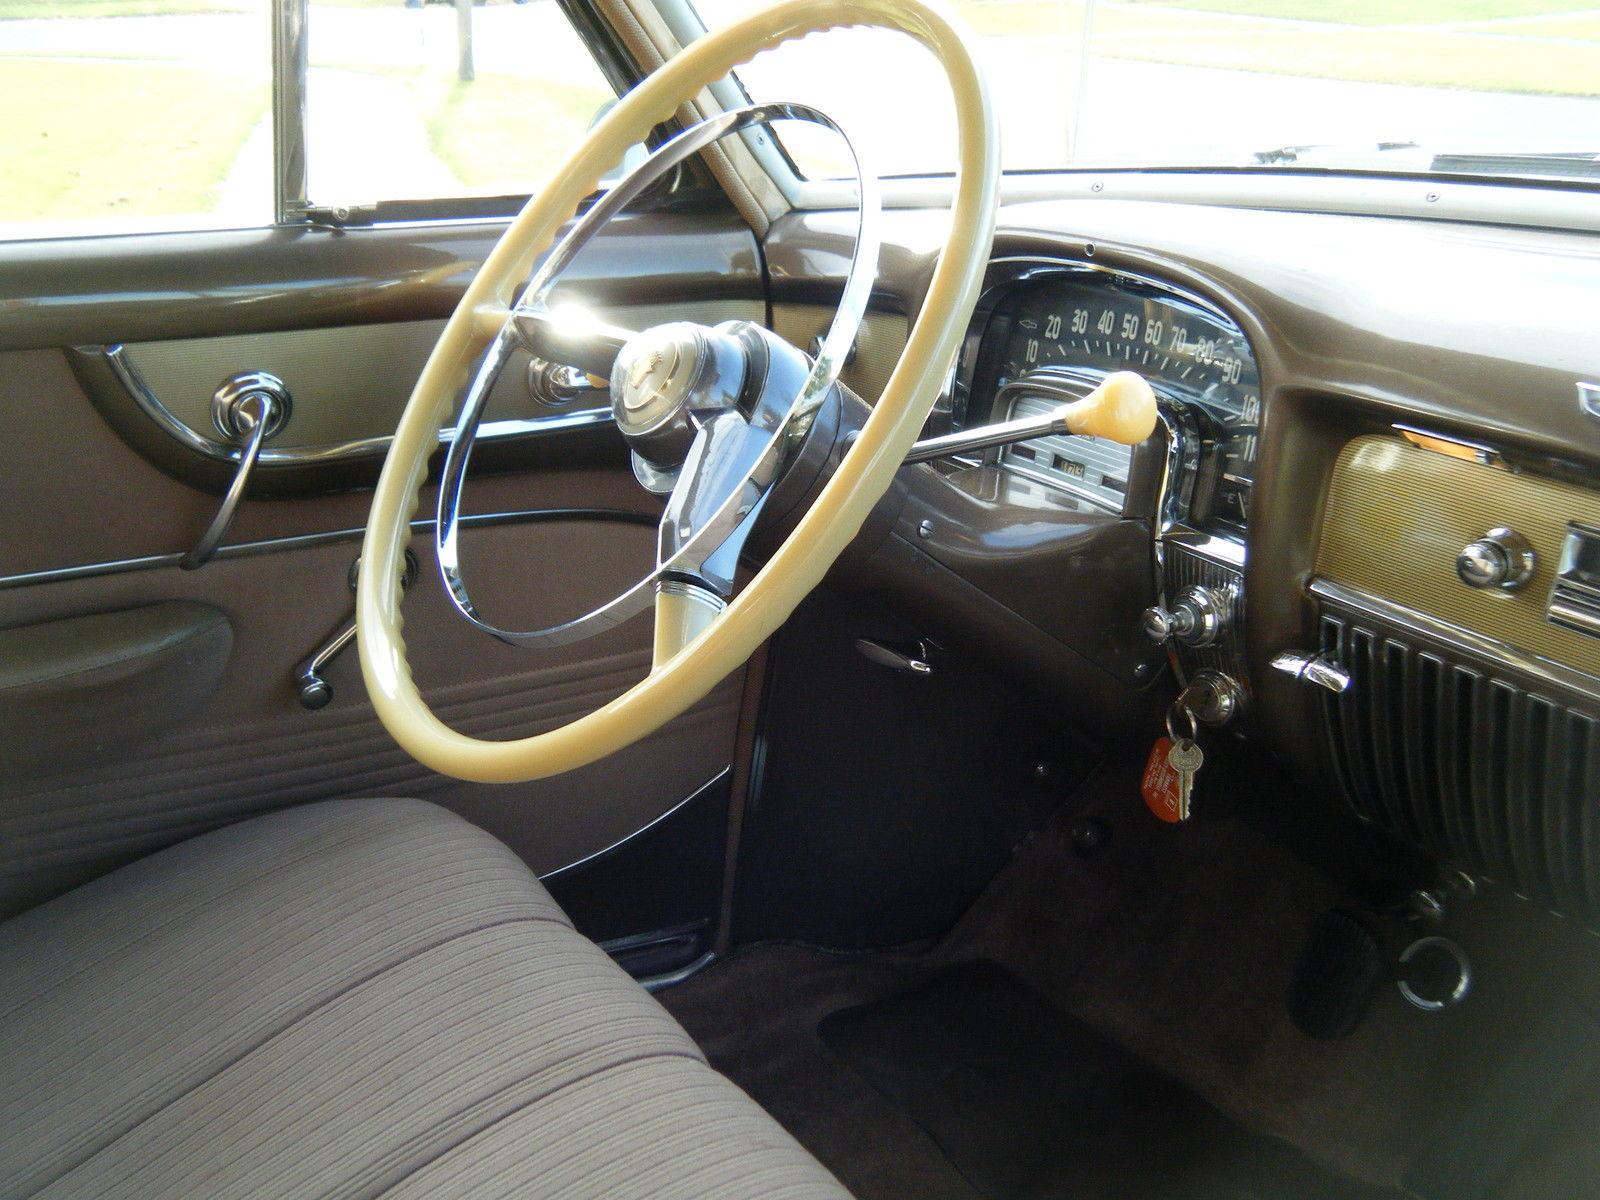 1951 Cadillac Coupe Very Rare Original Time Capsule 1950 1952 Series 62 1953 1959 1960